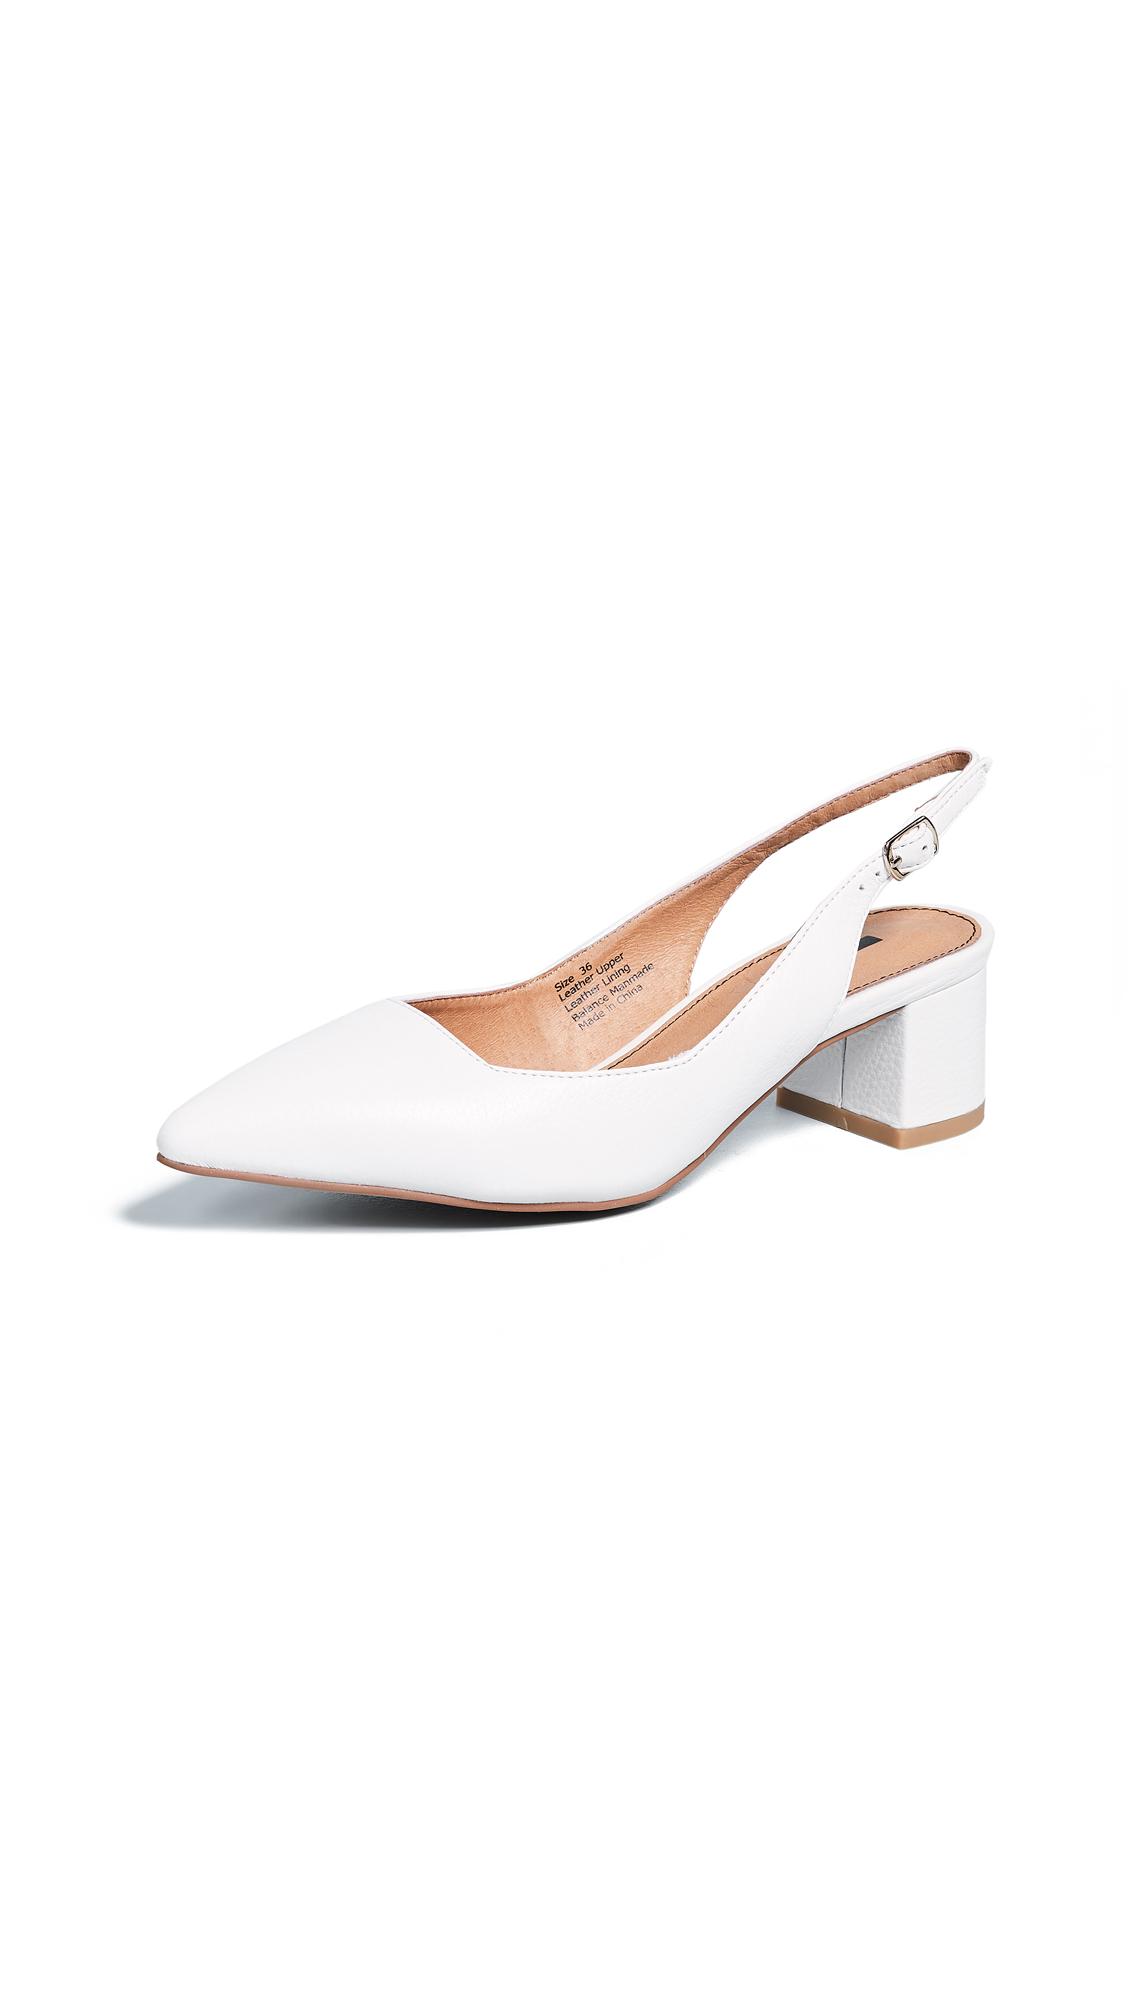 MATIKO Kassie Block Heel Pumps in White